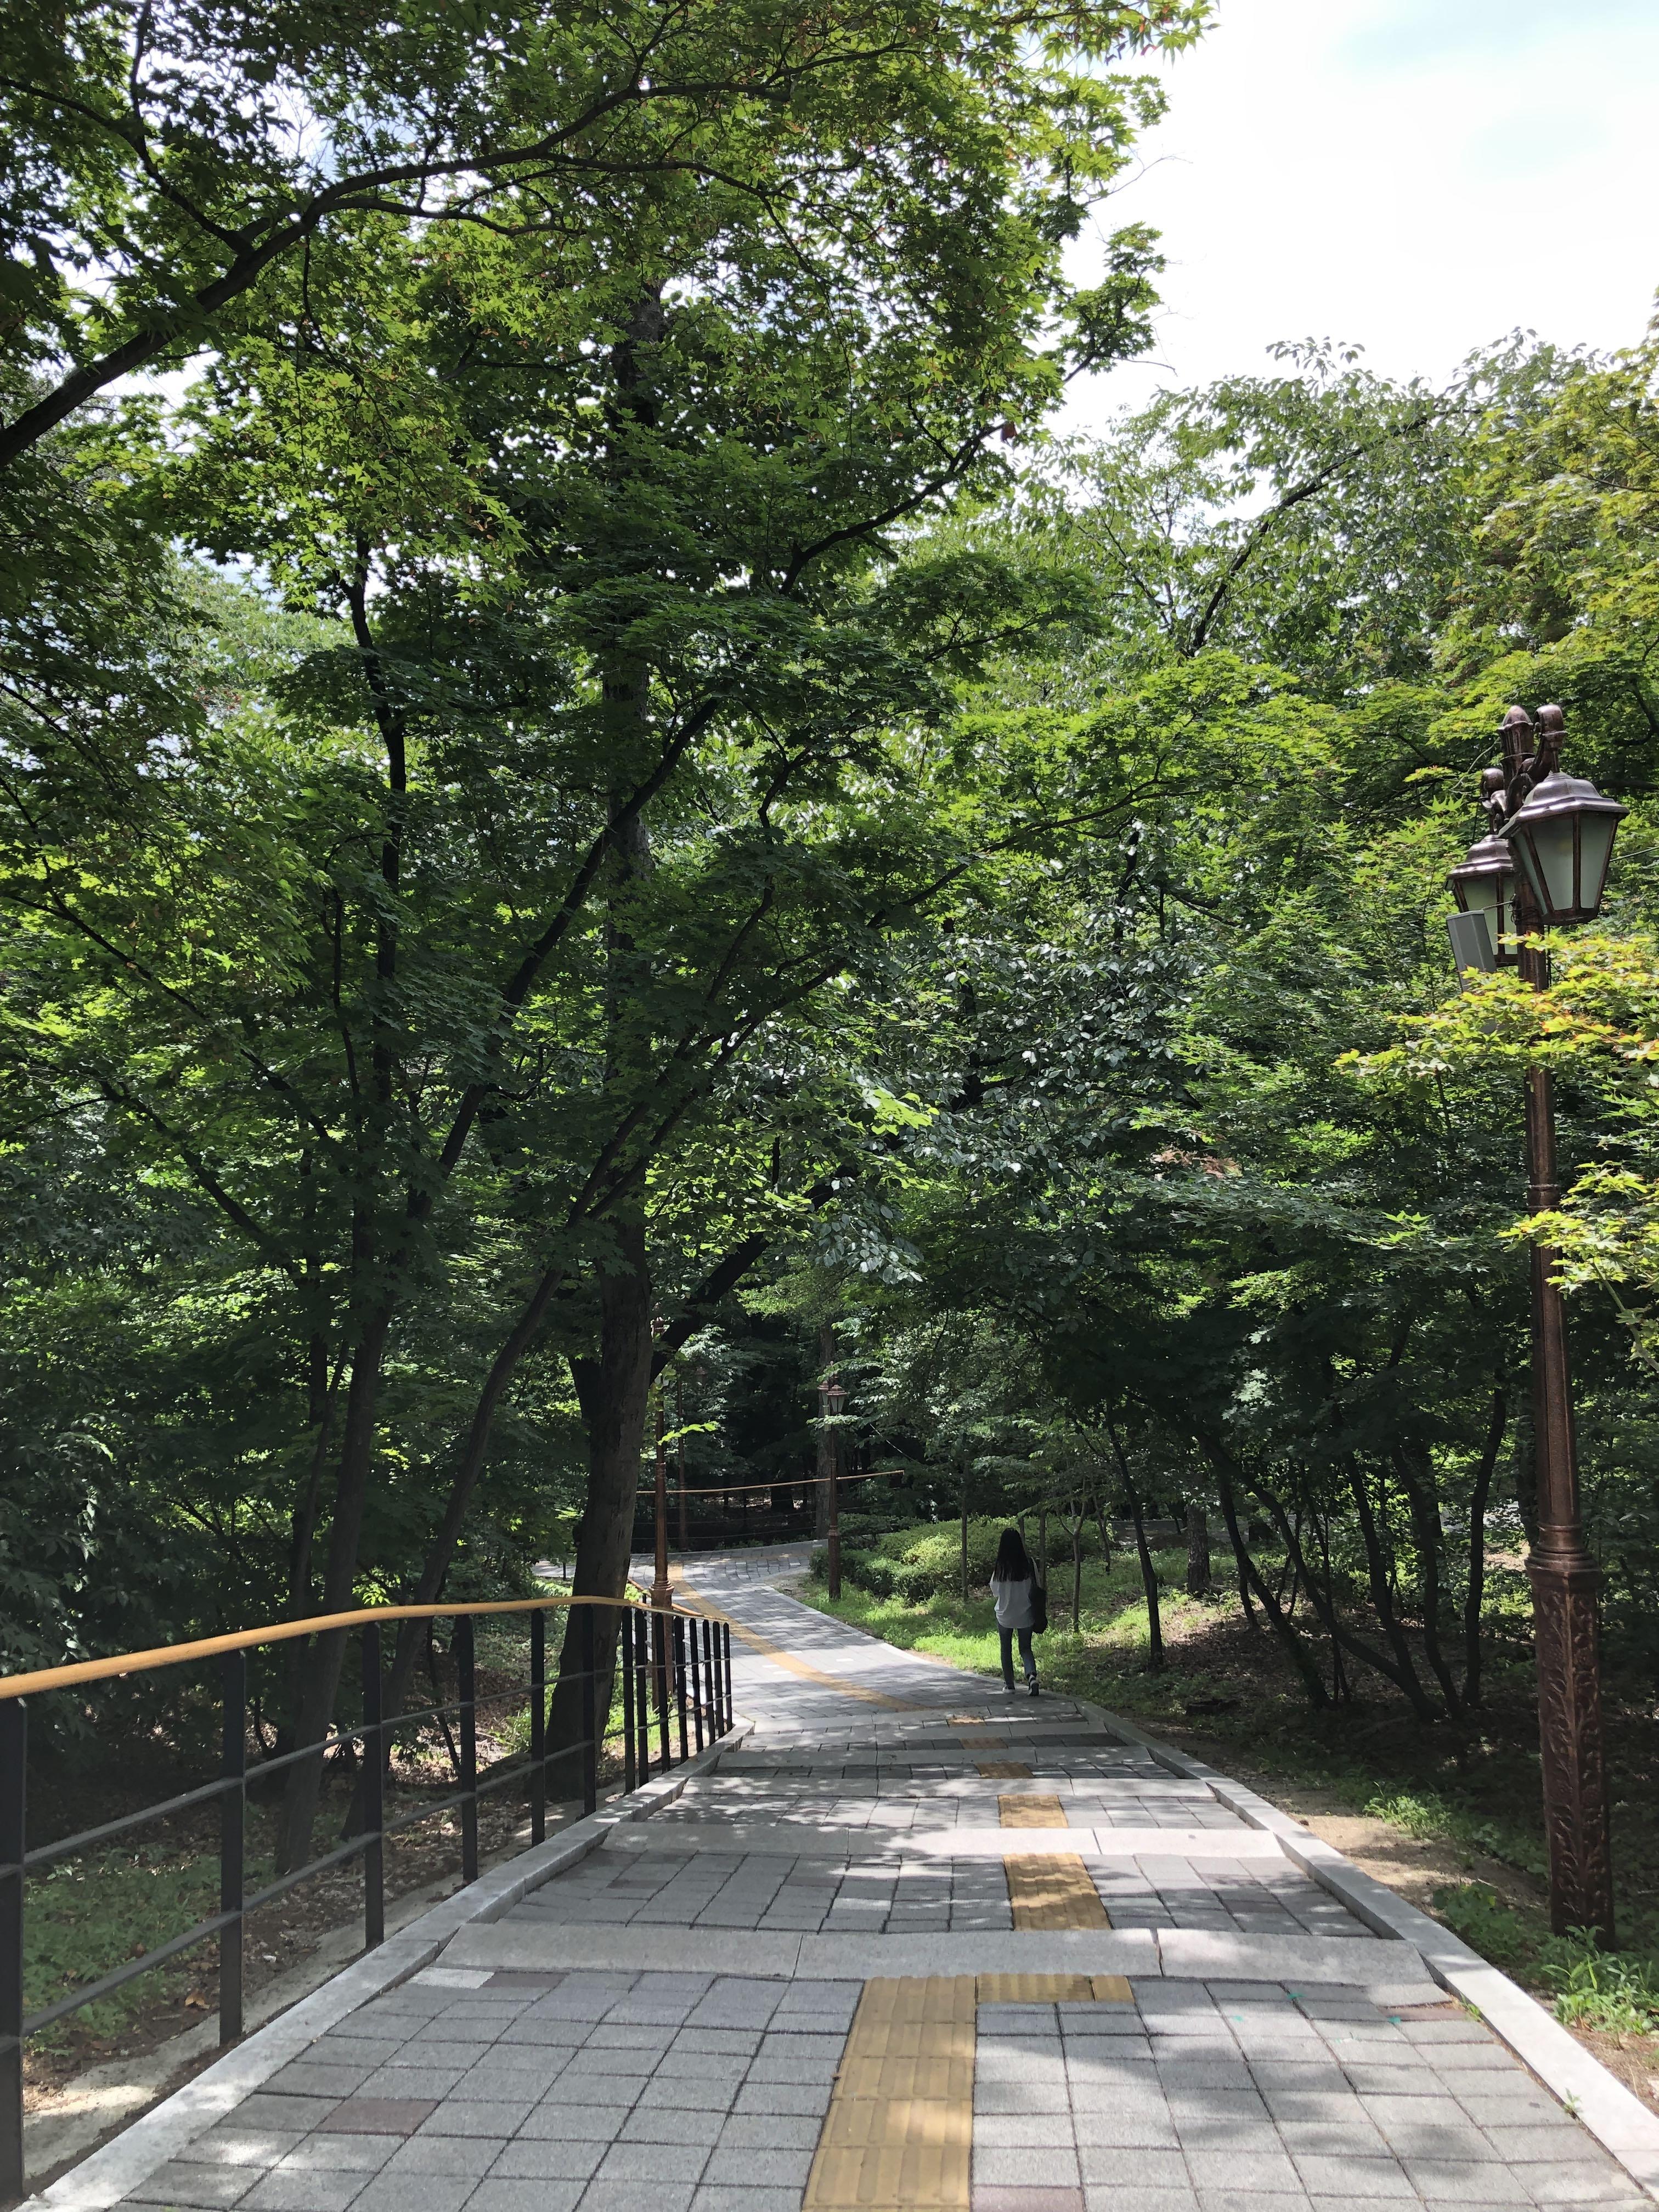 Kyung Hee University - campus photo 4